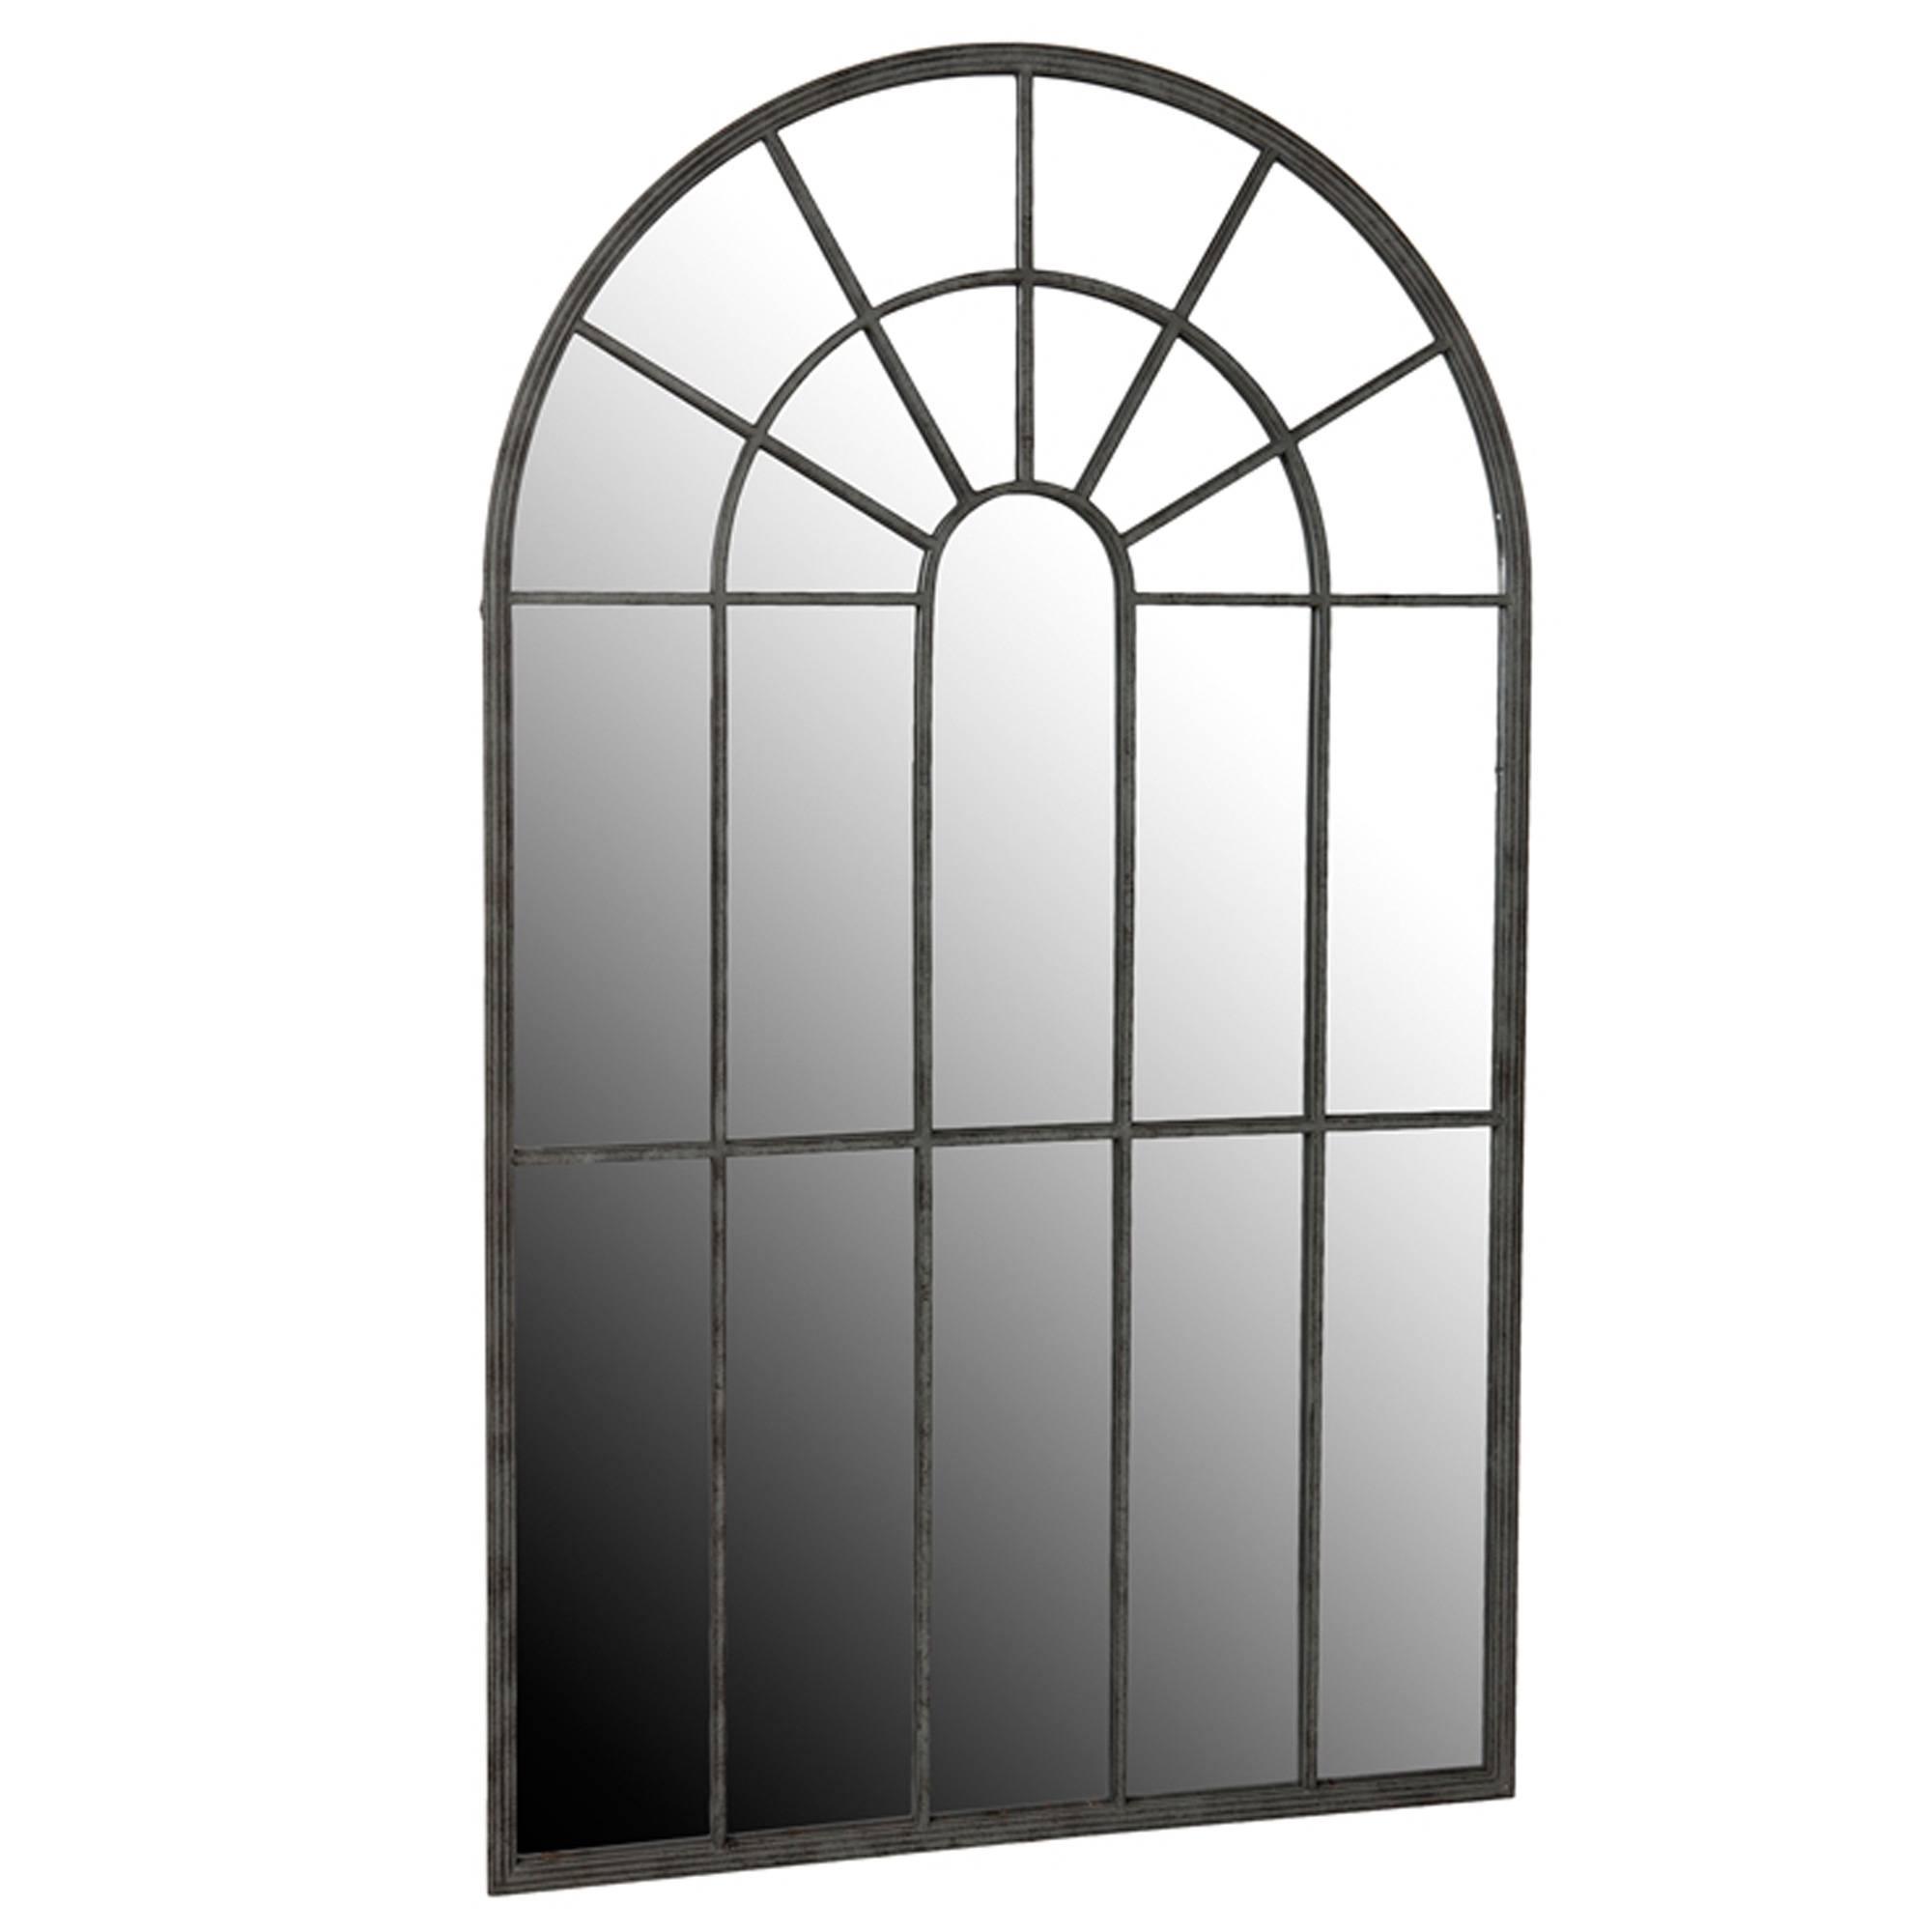 Outdoor Arch Garden Mirror Large | No 44 Furniture, Cobham Intended For Large Outdoor Garden Mirrors (View 14 of 15)